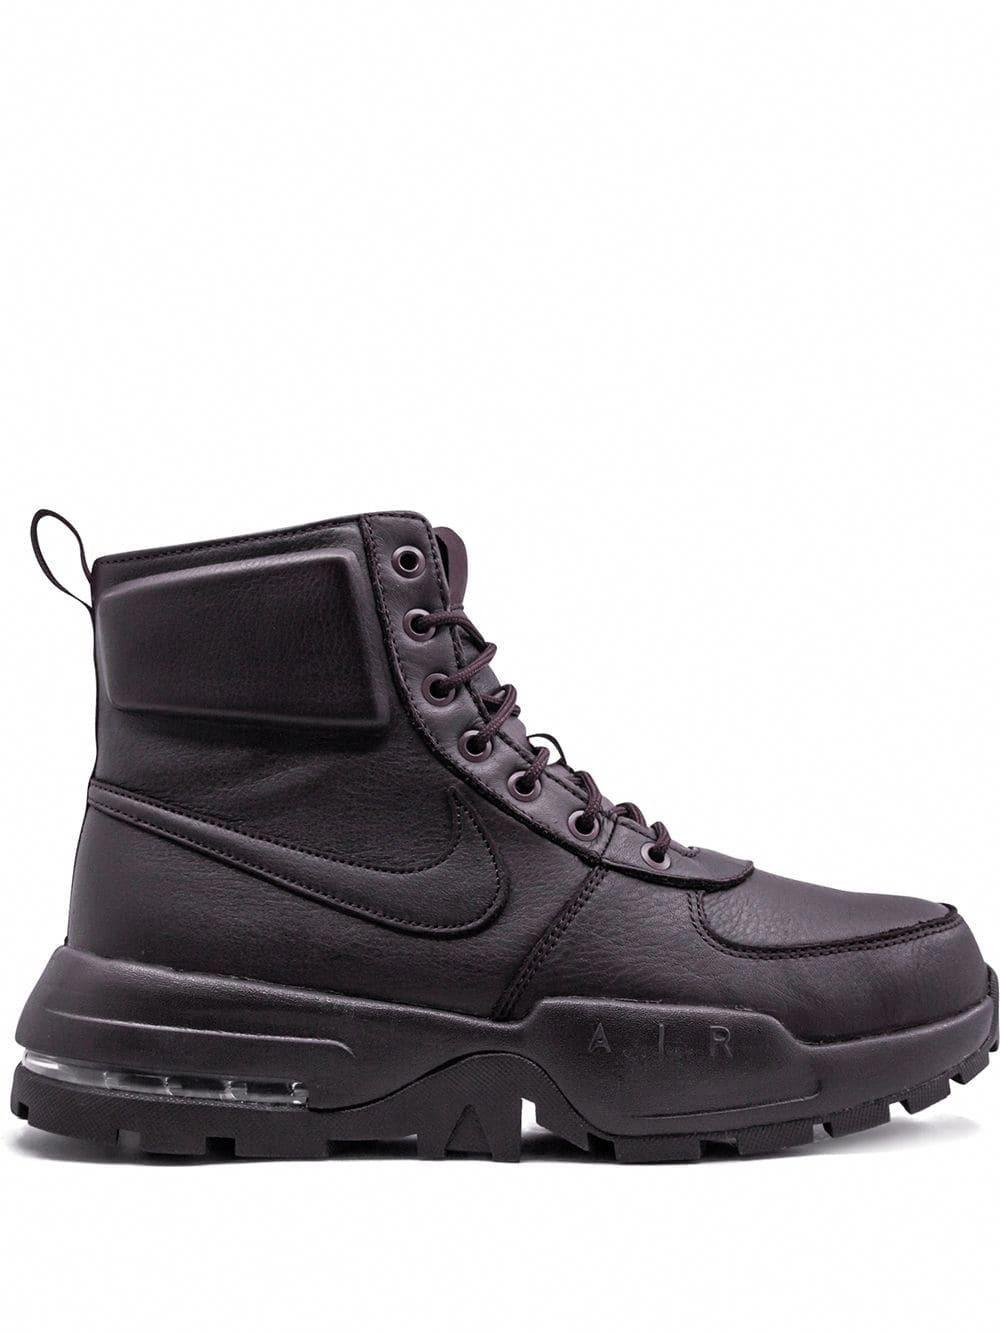 Nike Air Max Goaterra 2.0 sneakers